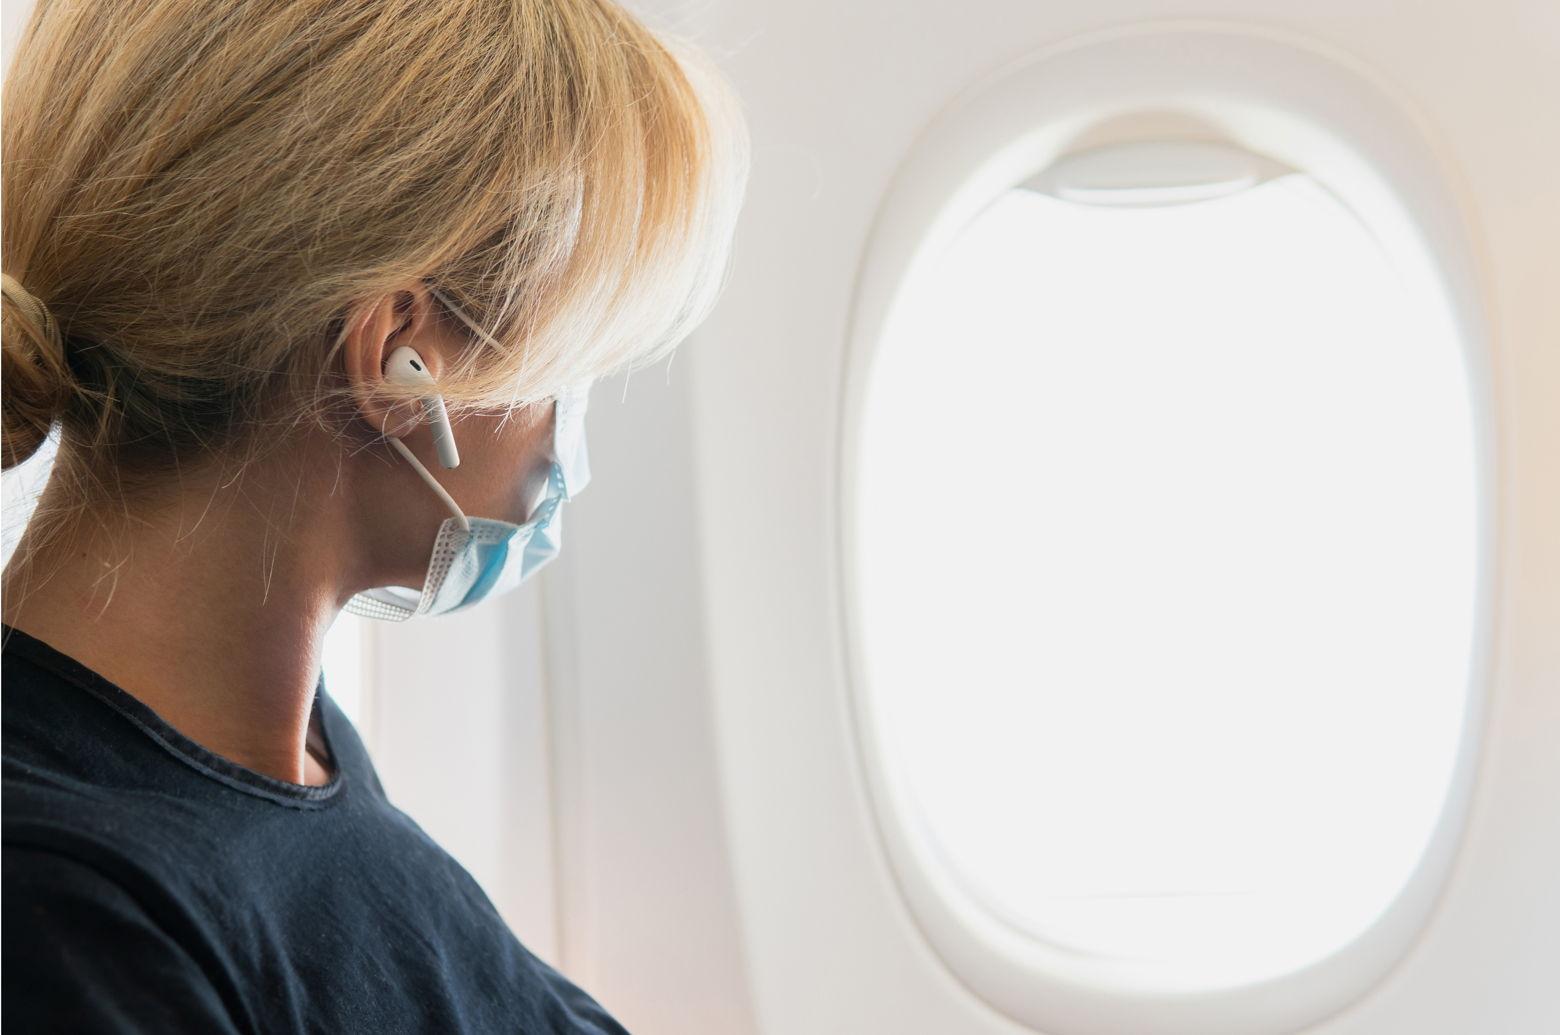 Grandma on an airplane